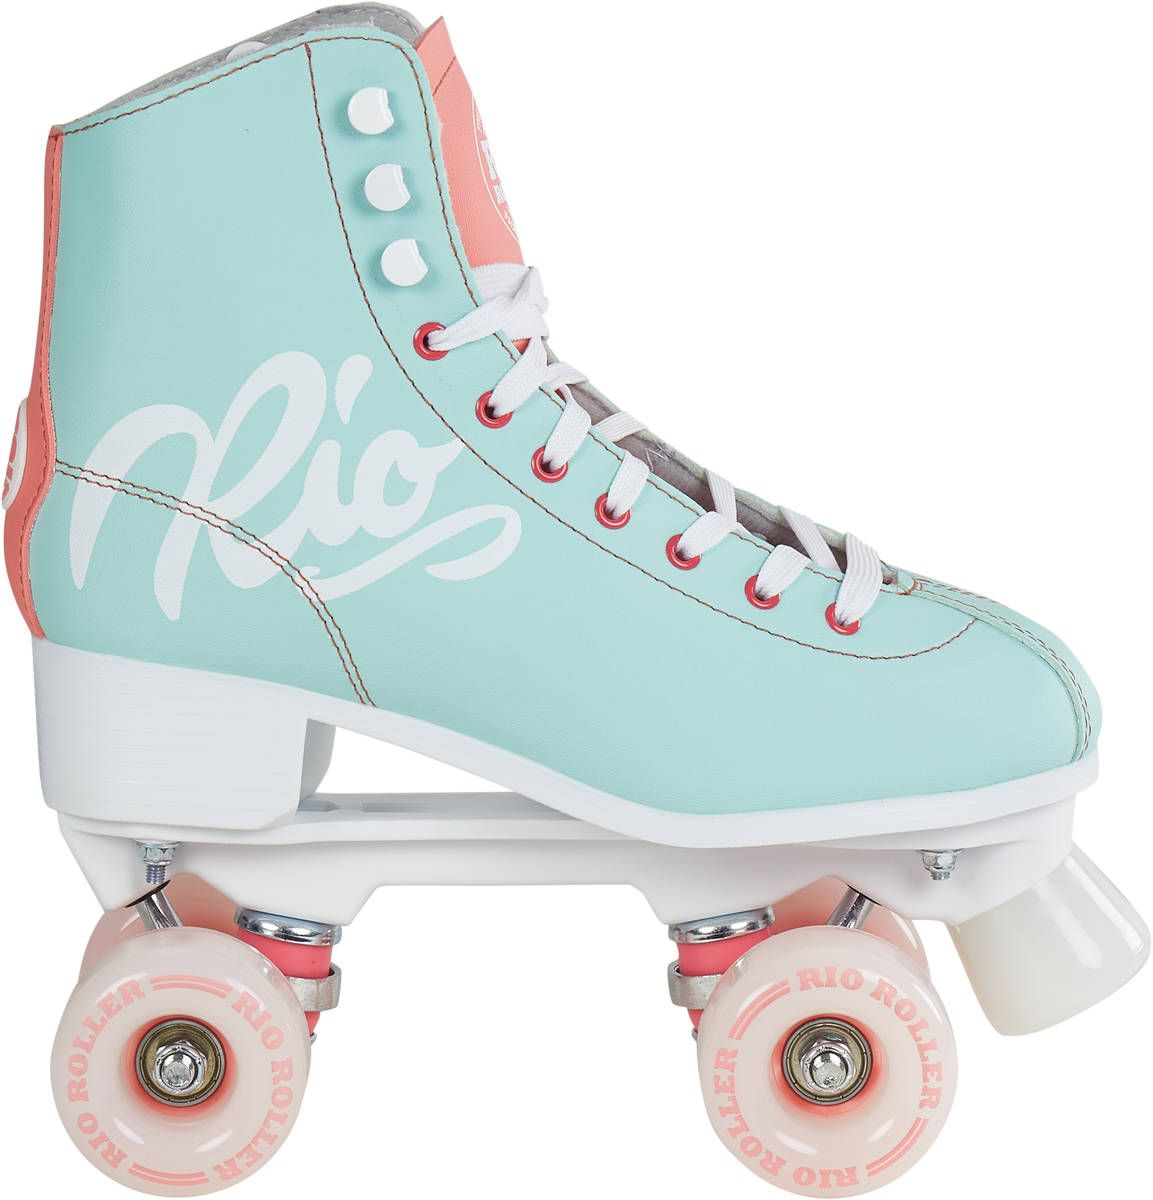 Rookie Authentic V2 Damen-Rollerschuhe Rollerskates Rollskates Skates Scooter